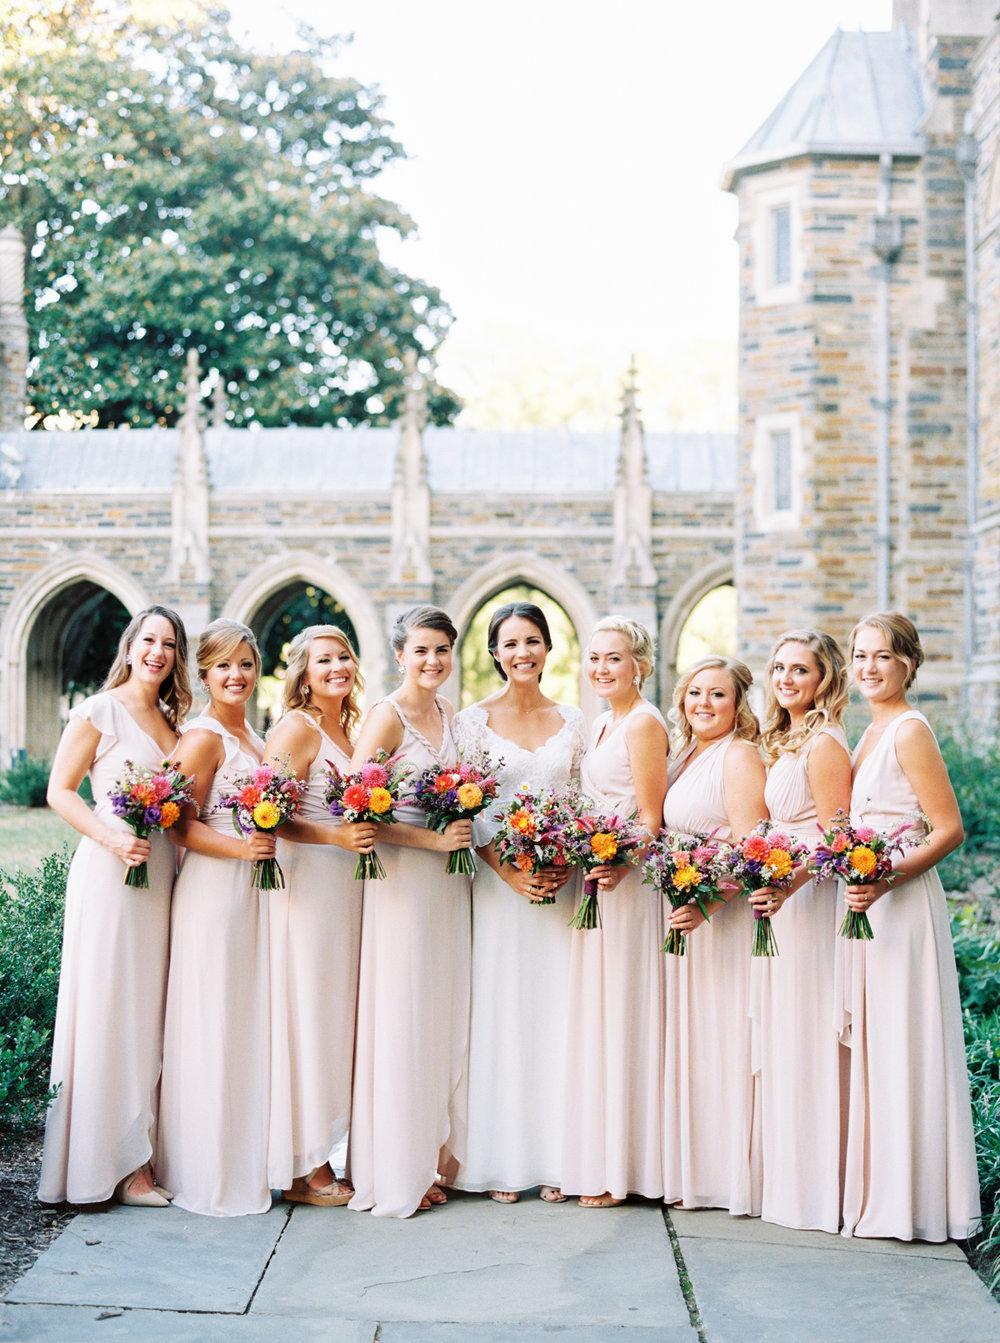 Bridesmaids6.jpg